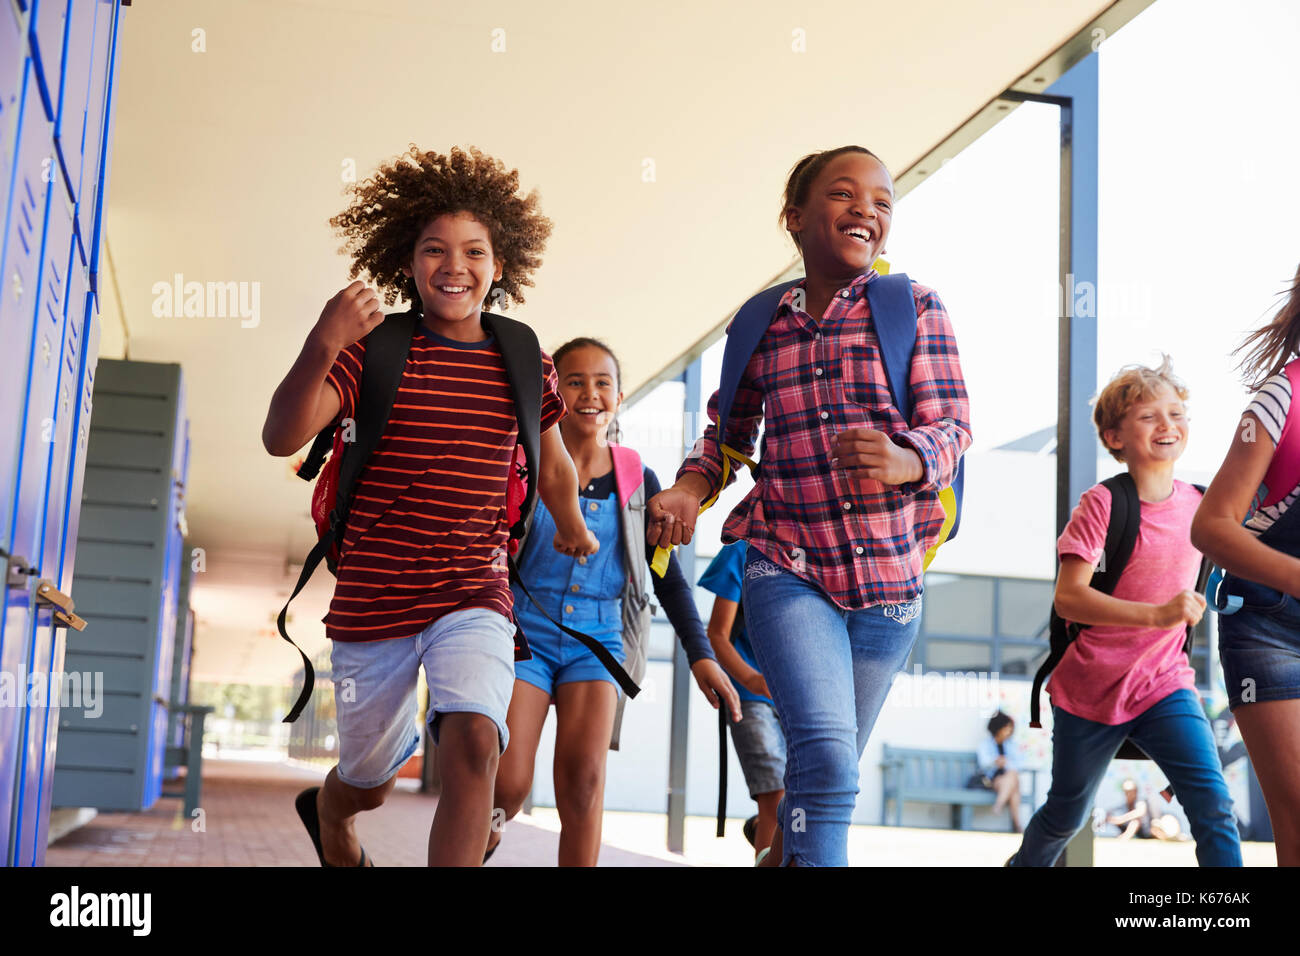 School kids running to camera in school hallway, close up - Stock Image